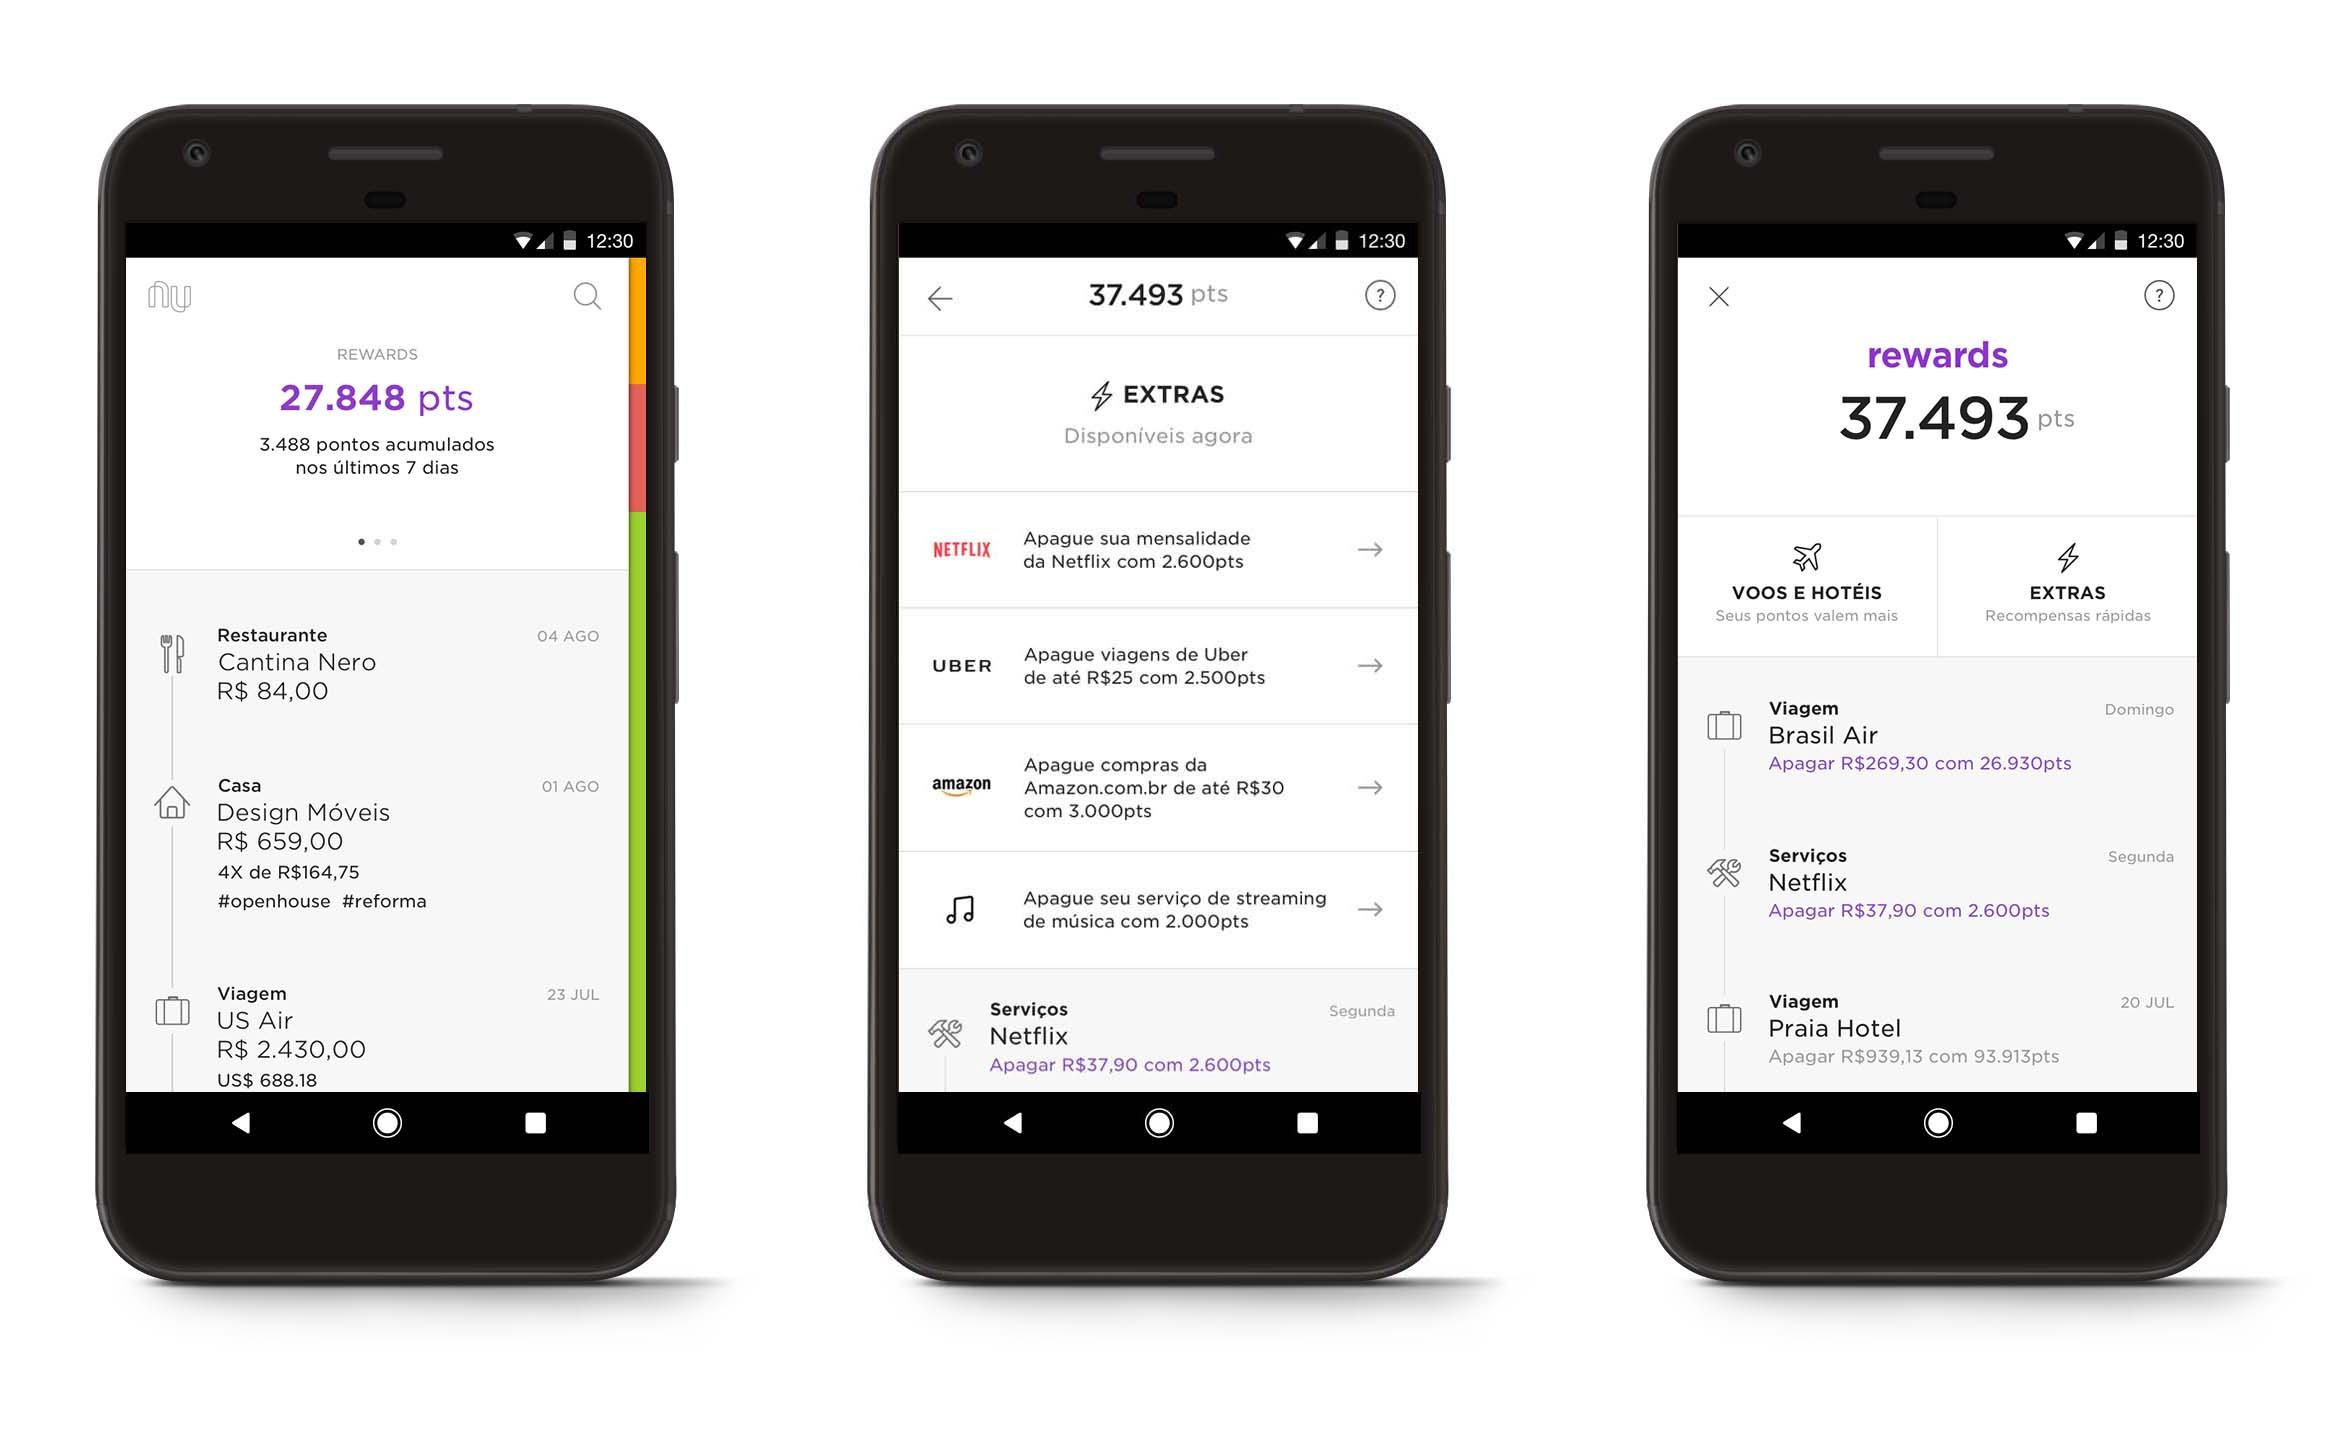 Nubank_App_Rewards_01